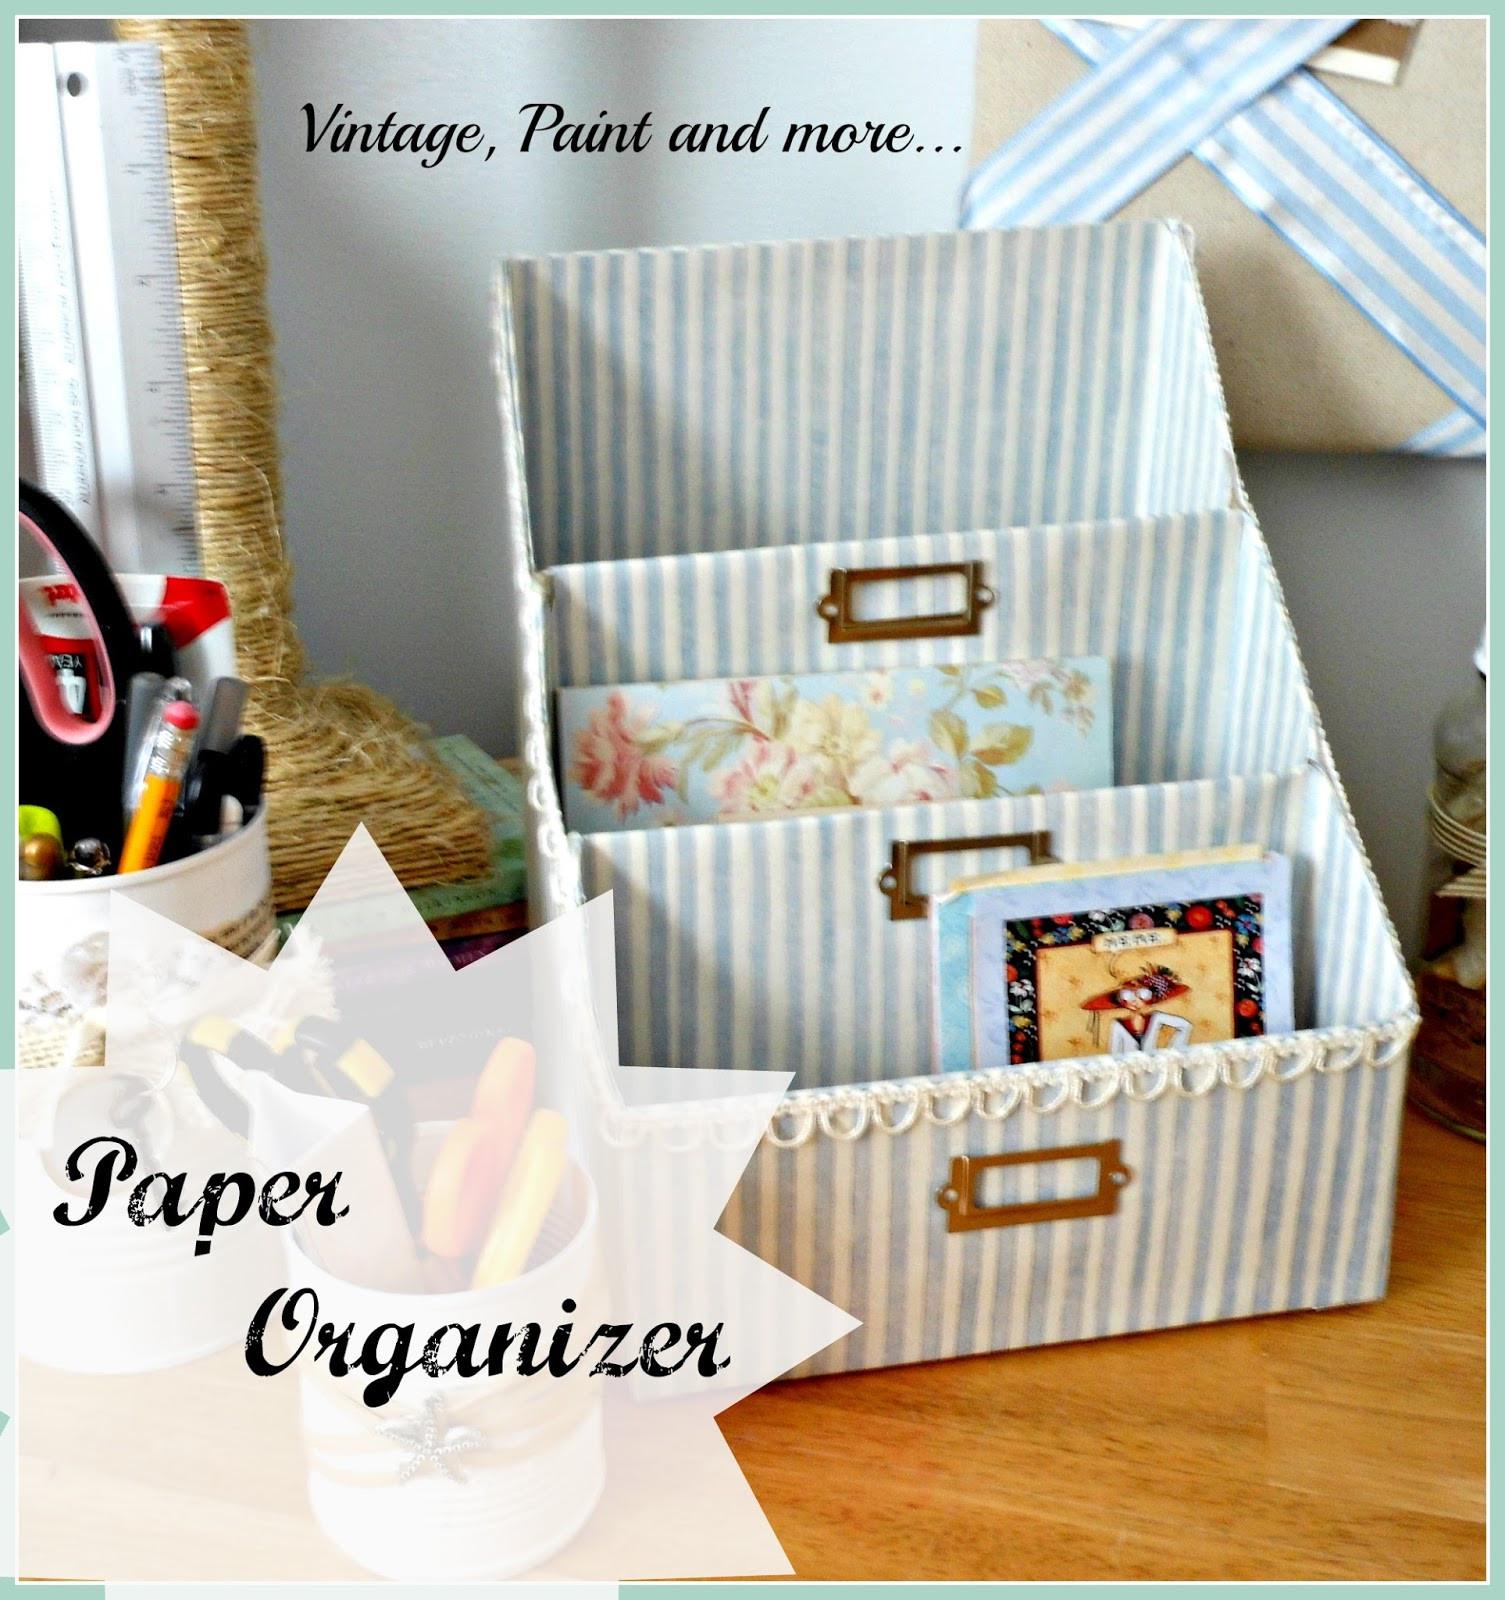 Best ideas about Cardboard Organizer DIY . Save or Pin DIY Paper Organizer Now.